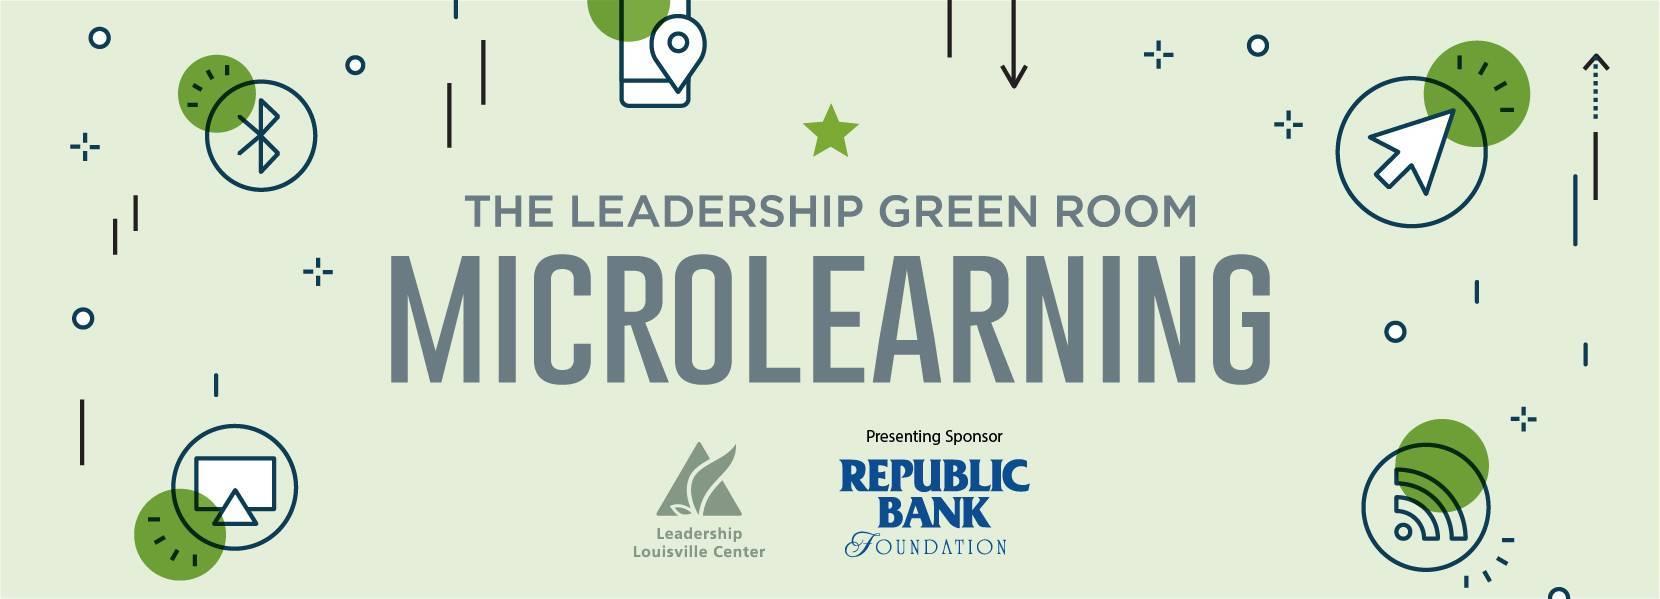 Leadership Green Room Microlearning